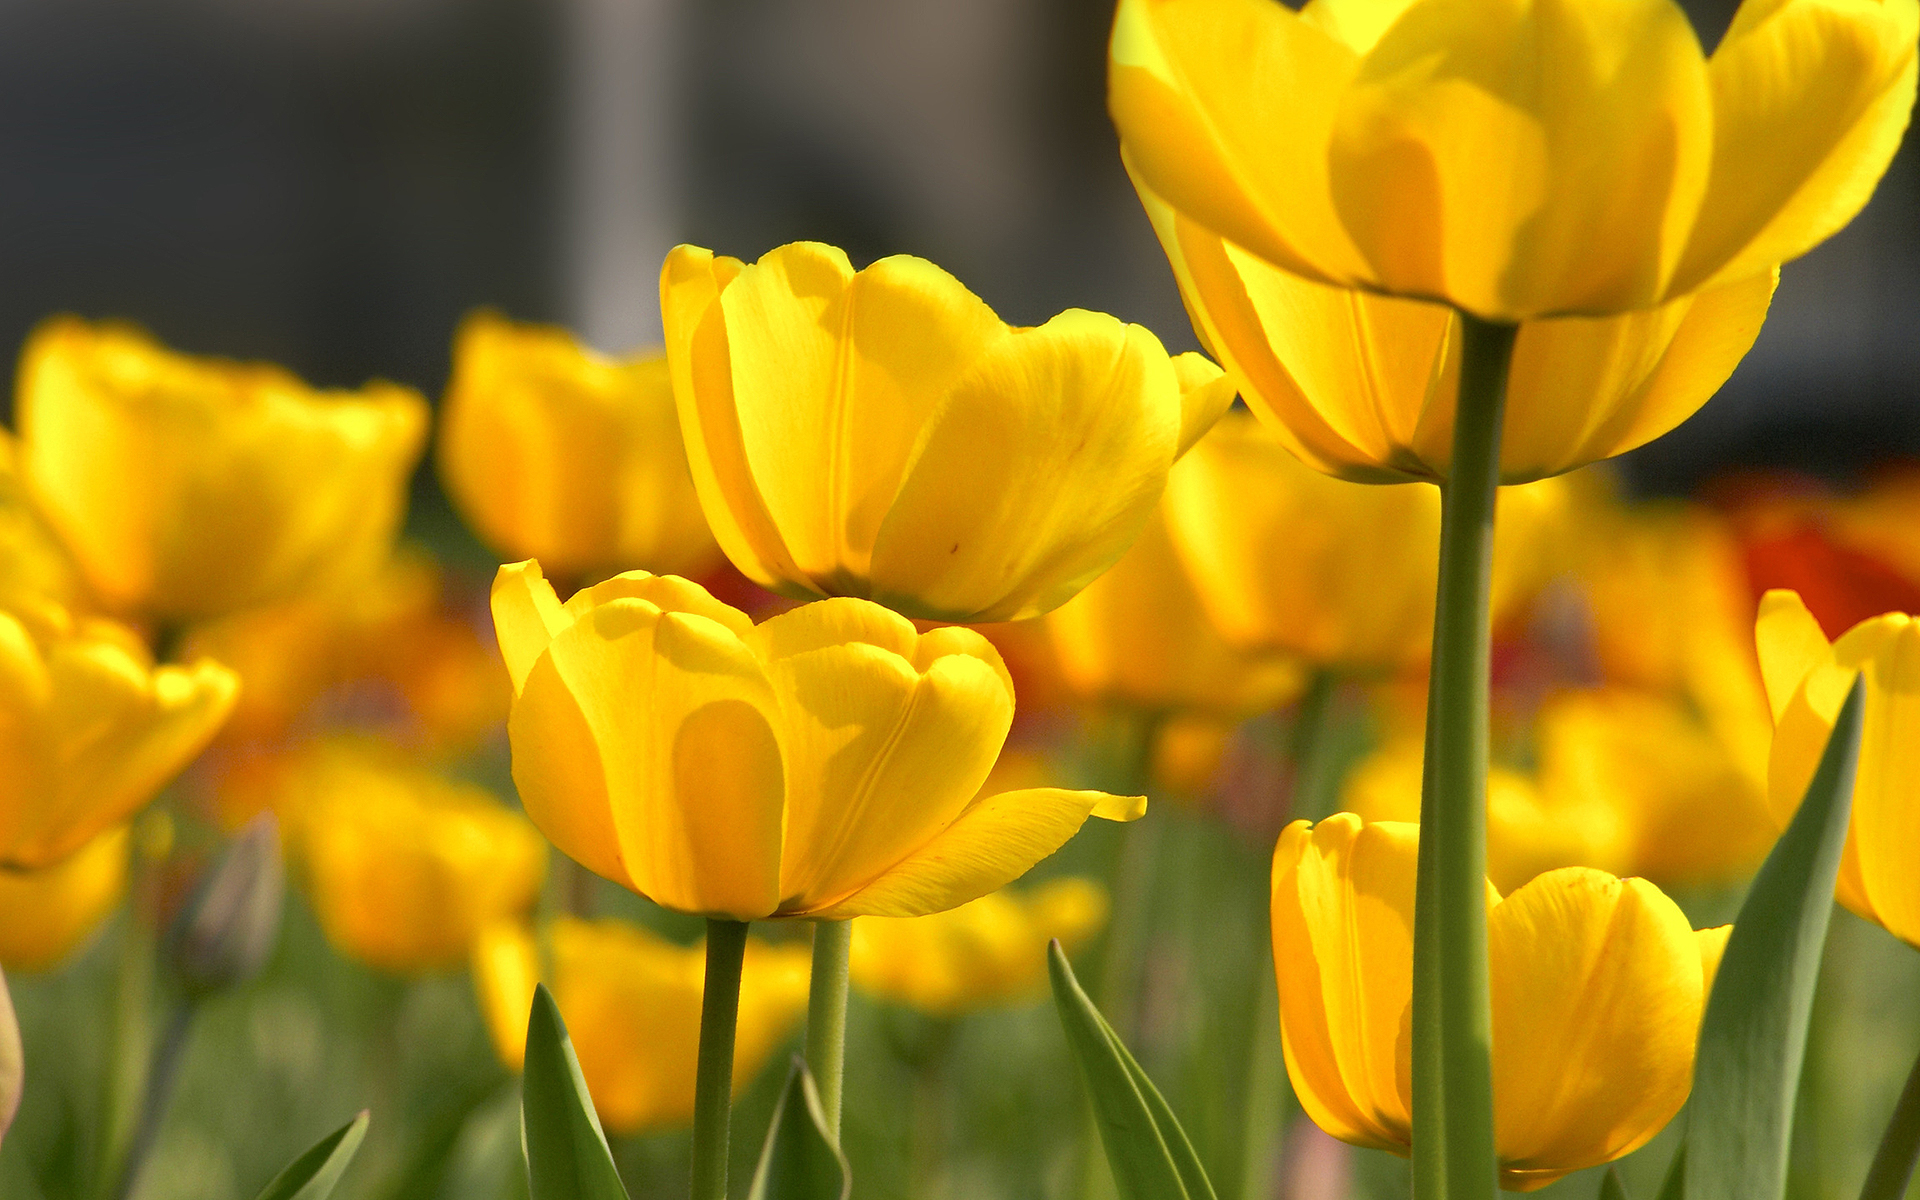 yellow flower petals